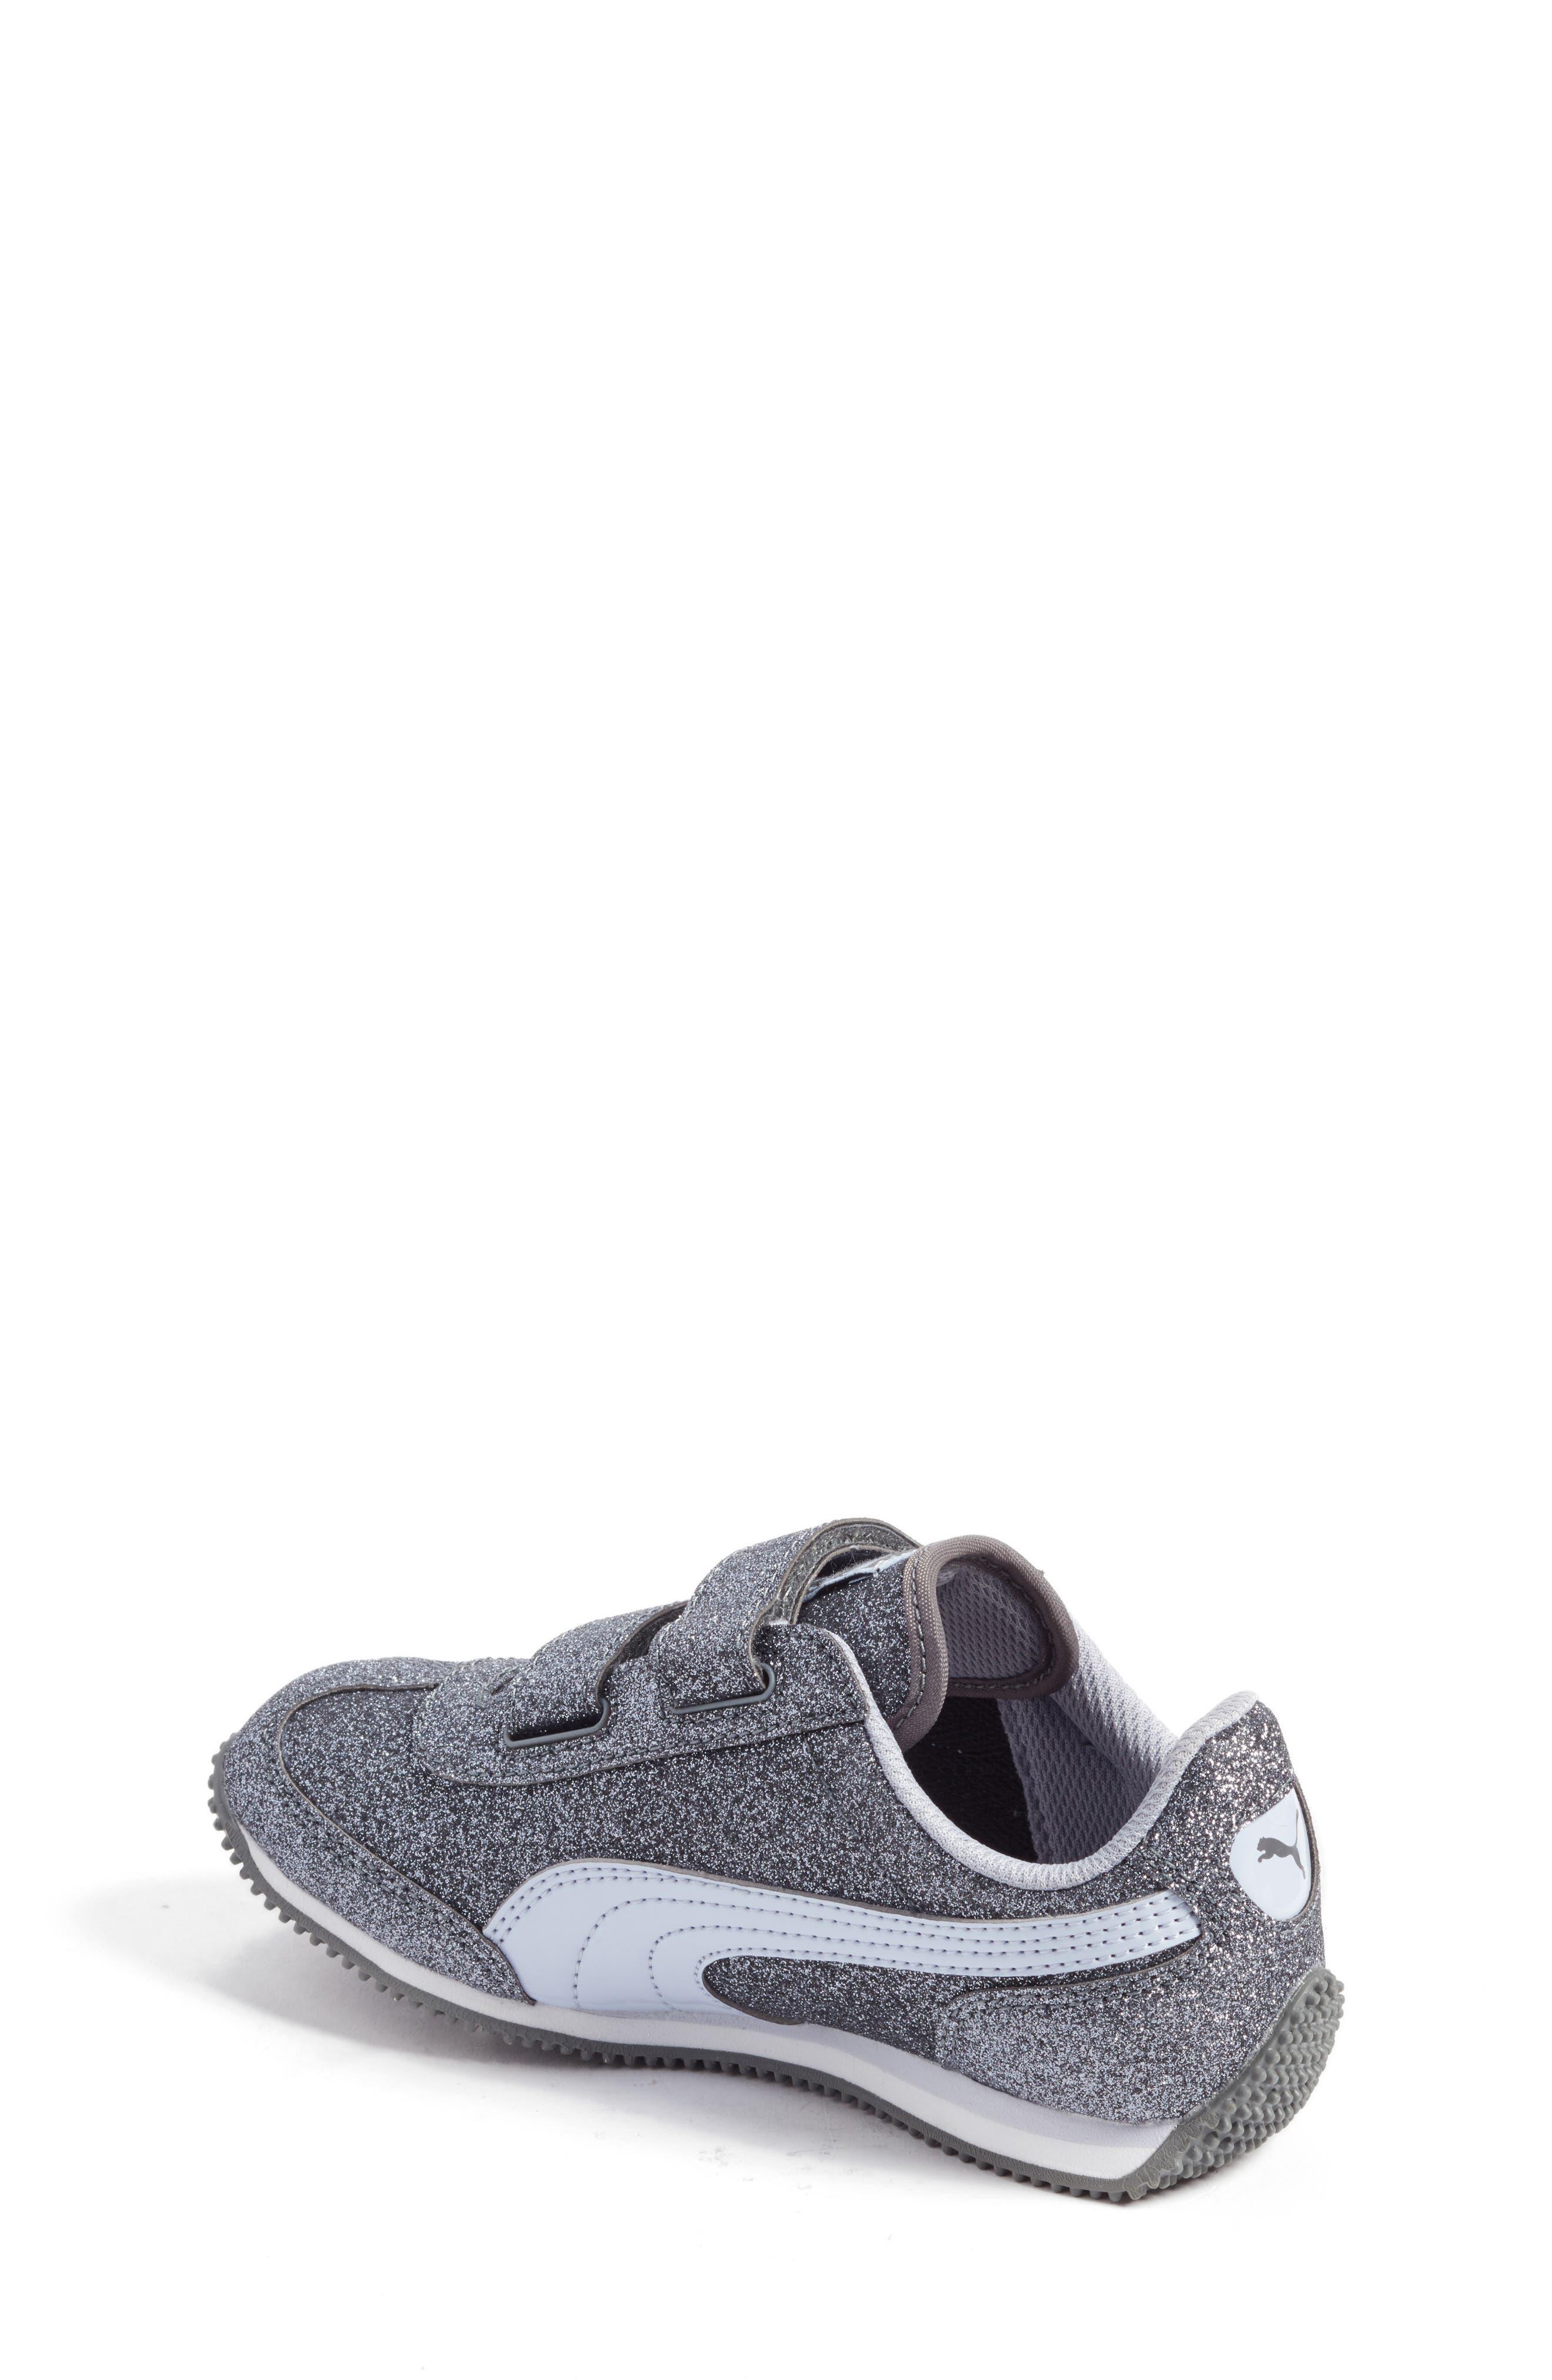 Whirlwind Glitz Sneaker,                             Alternate thumbnail 2, color,                             400